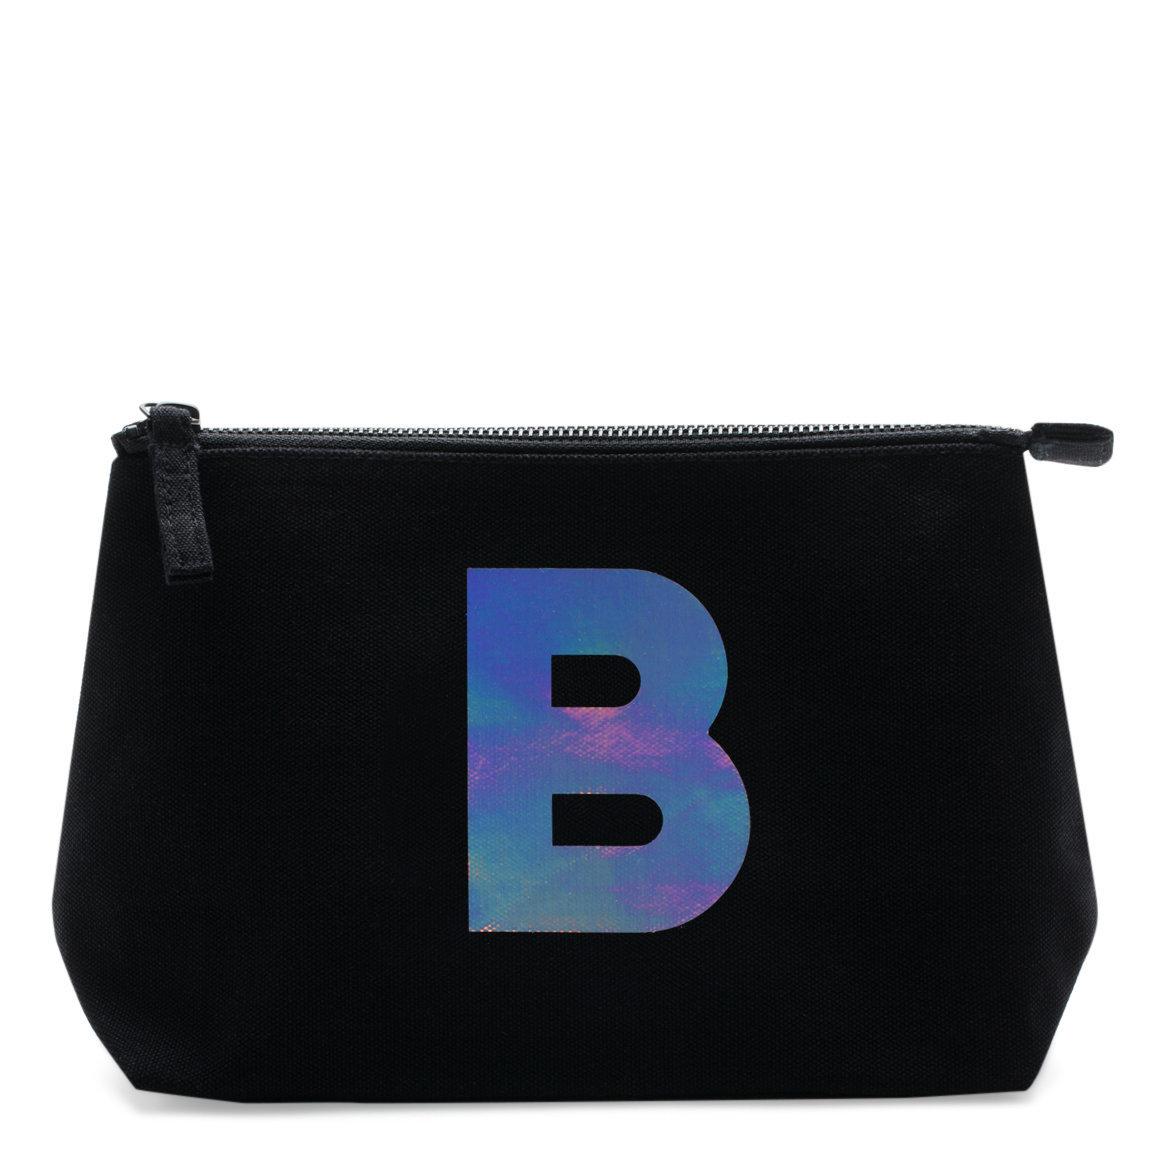 Alphabet Bags Holographic Foil Initial Makeup Bag Letter B product swatch.